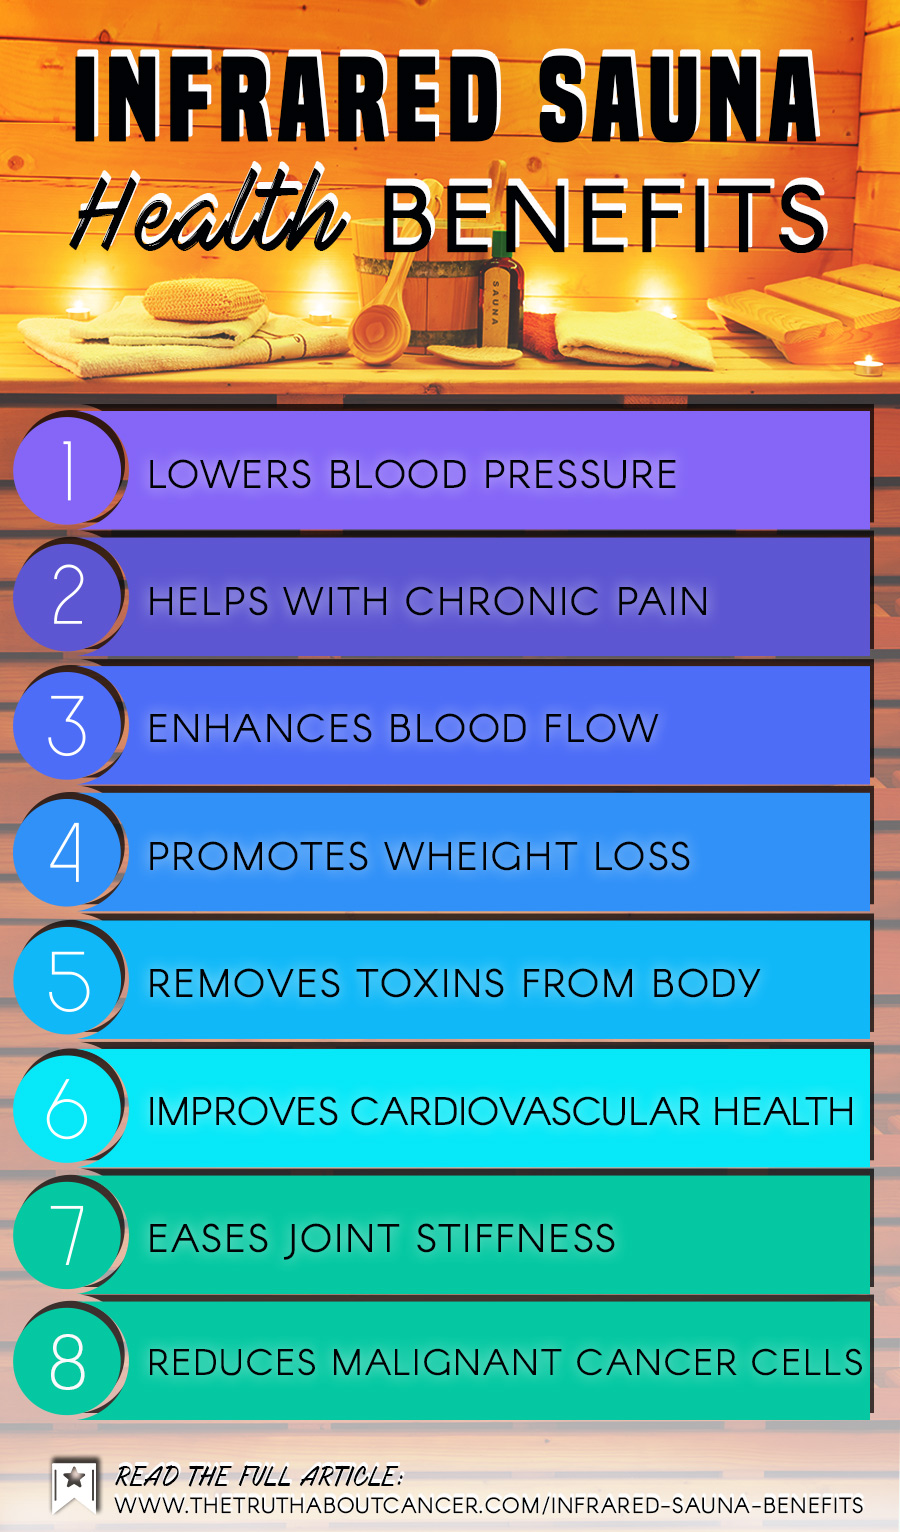 Infrared sauna health benefits